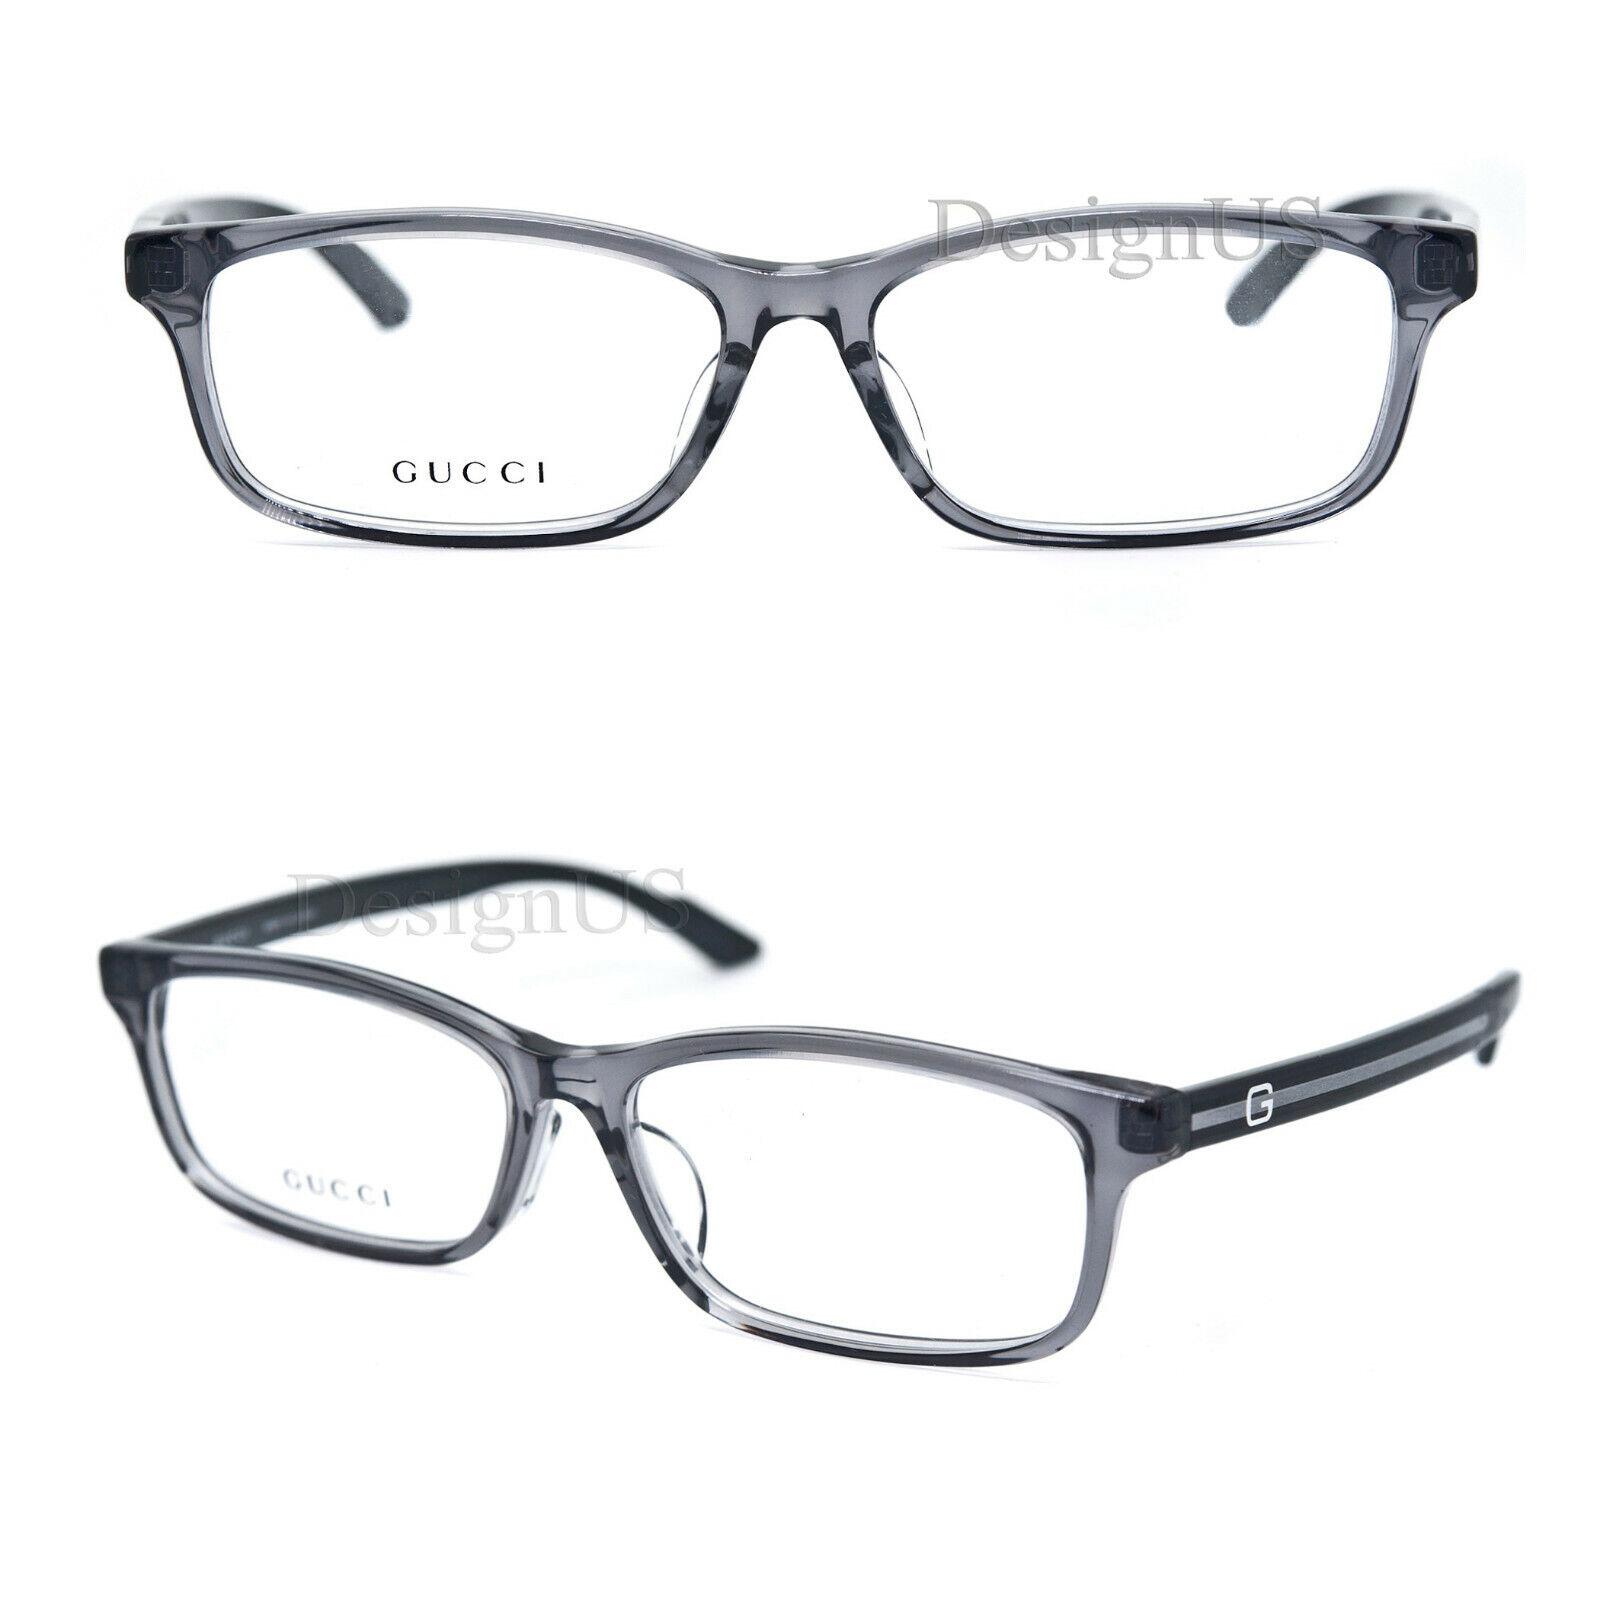 GUCCI GG-9091J 4AP Gray Transparent 55/15/140 Eyeglasses Rx